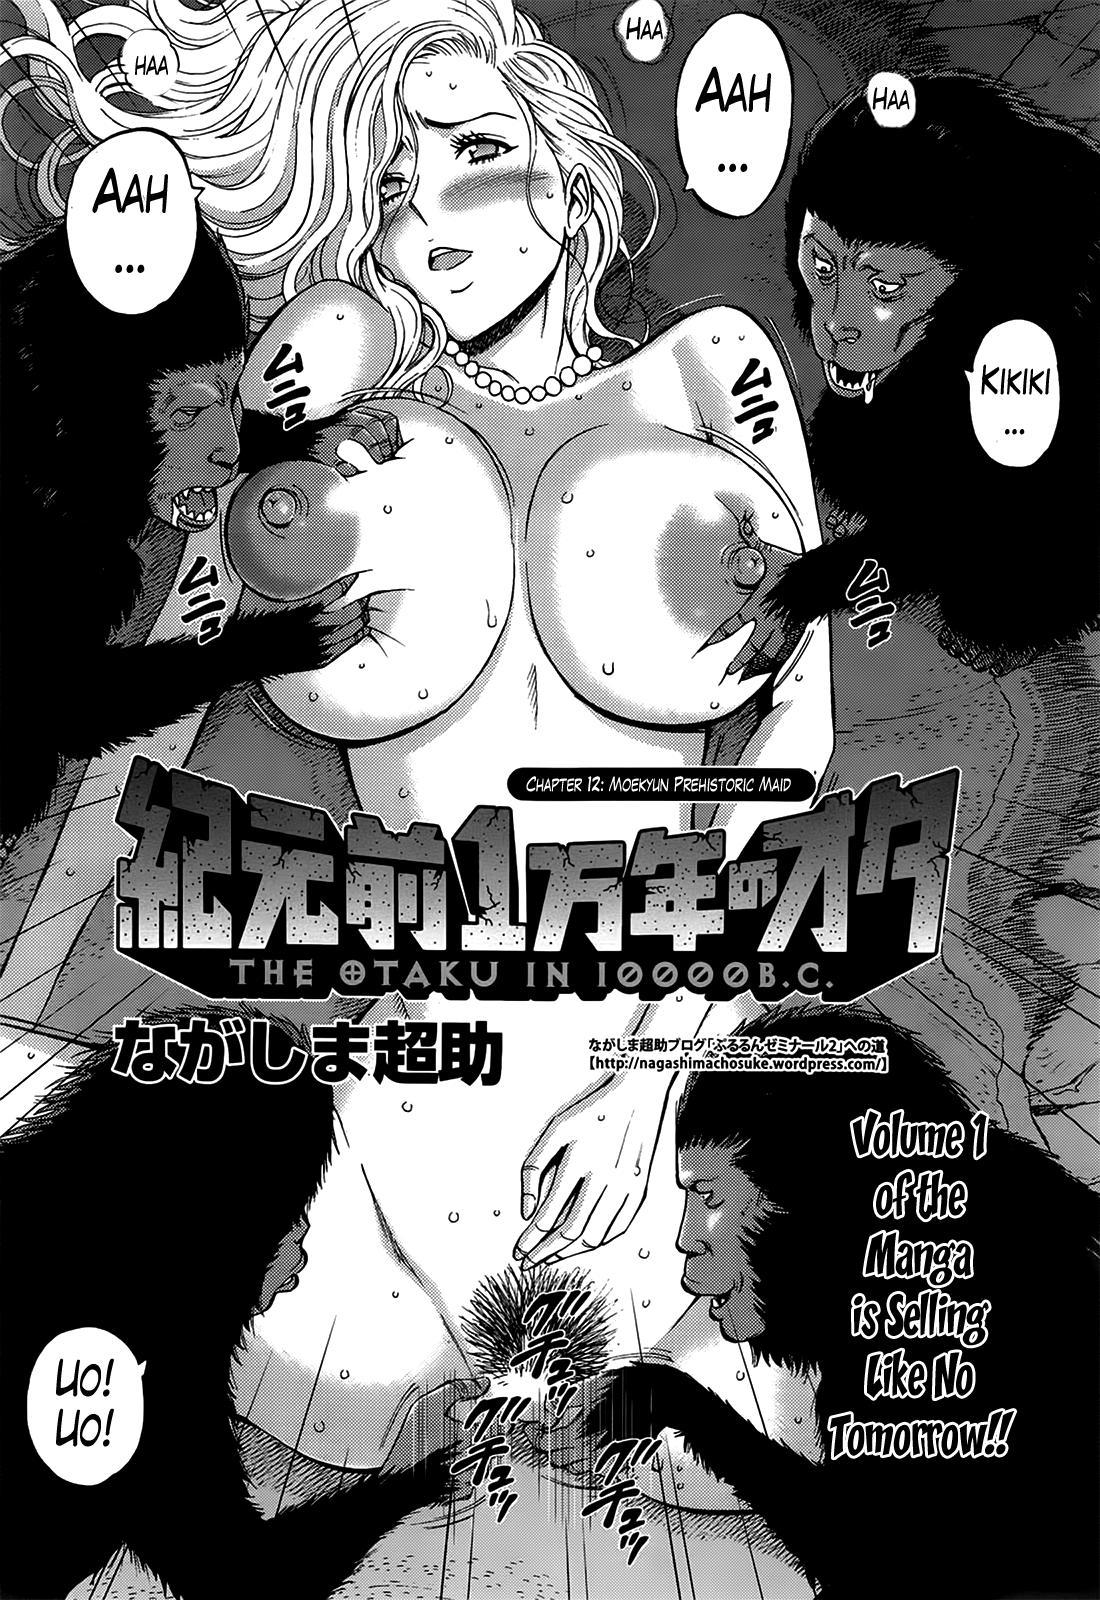 Kigenzen 10000 Nen no Ota   The Otaku in 10,000 B.C. Ch. 1-22 216